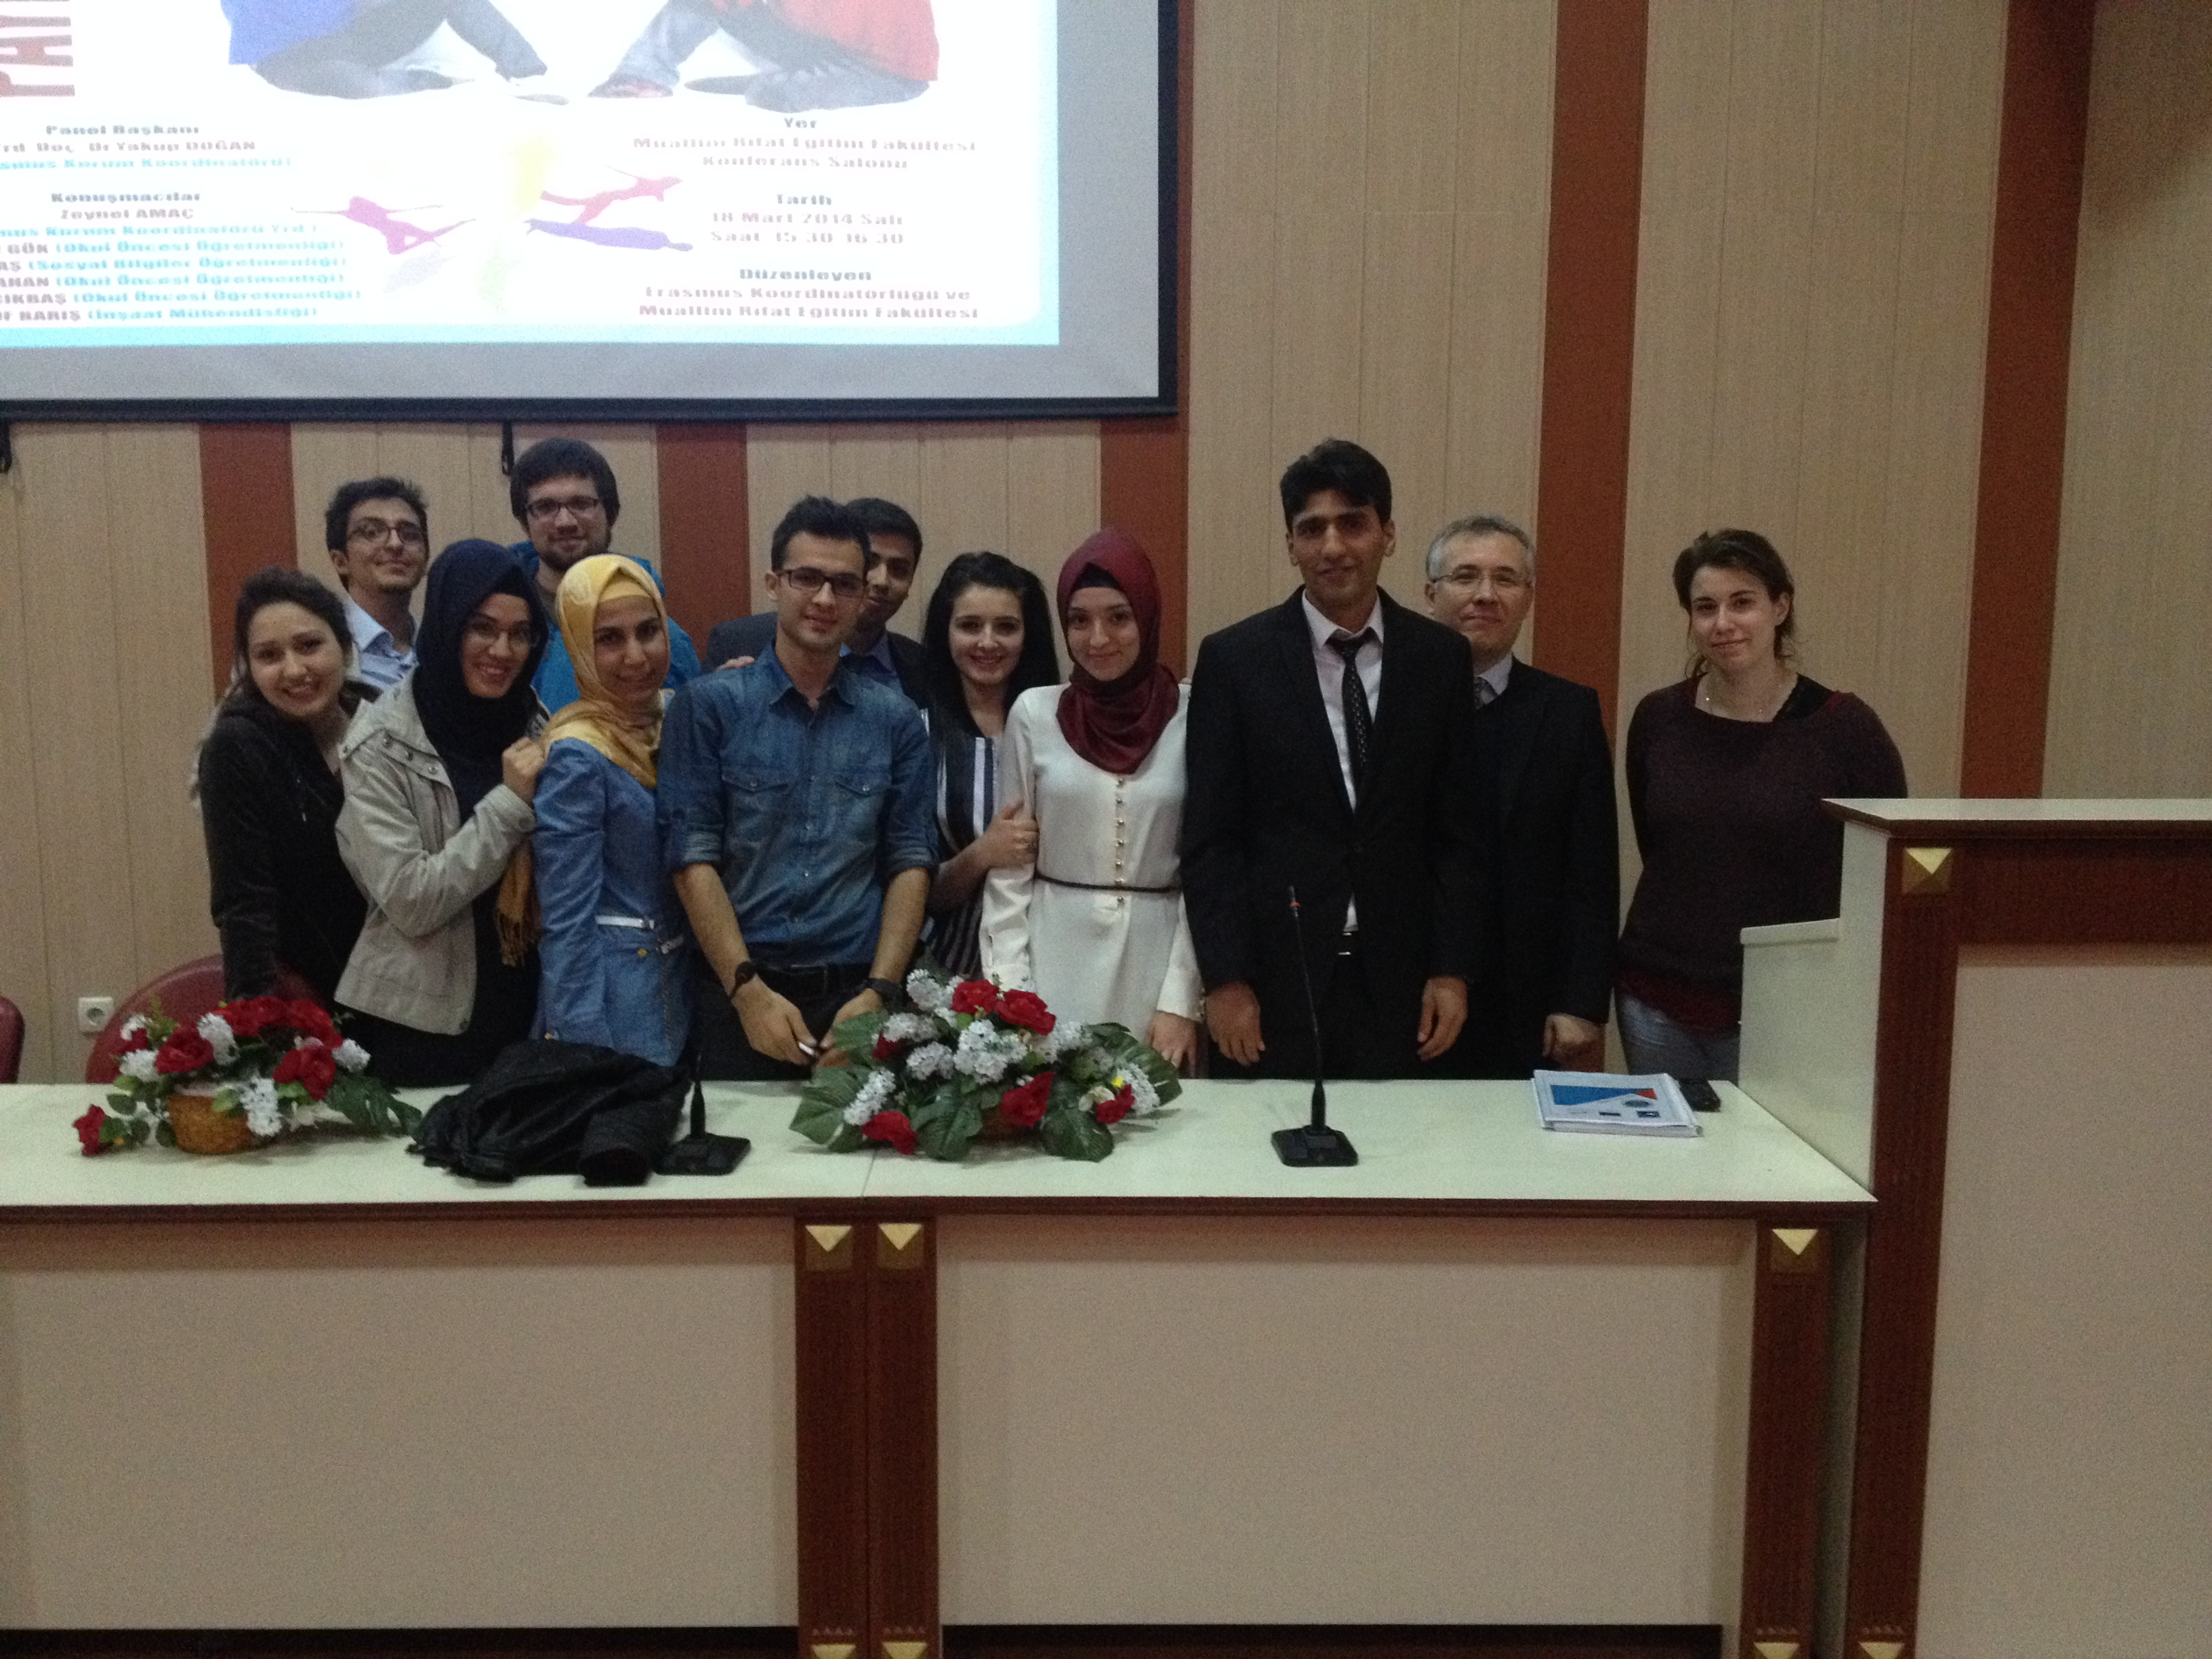 Erasmus+ Panel 3